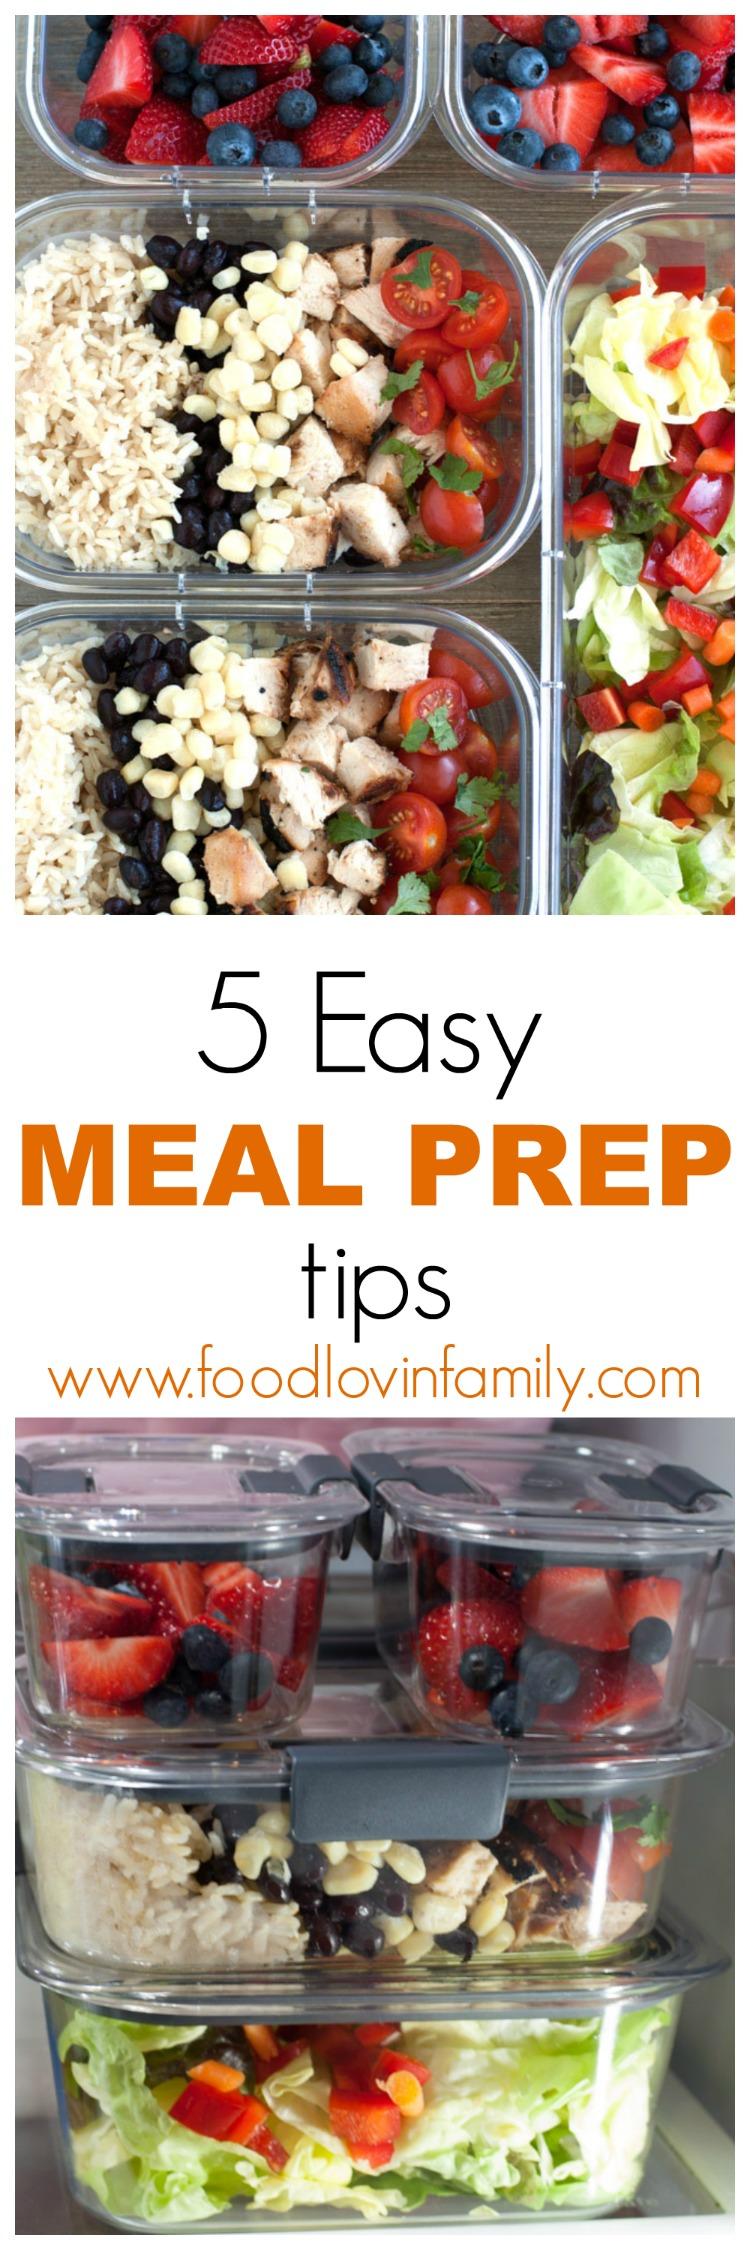 5 easy meal prep tips